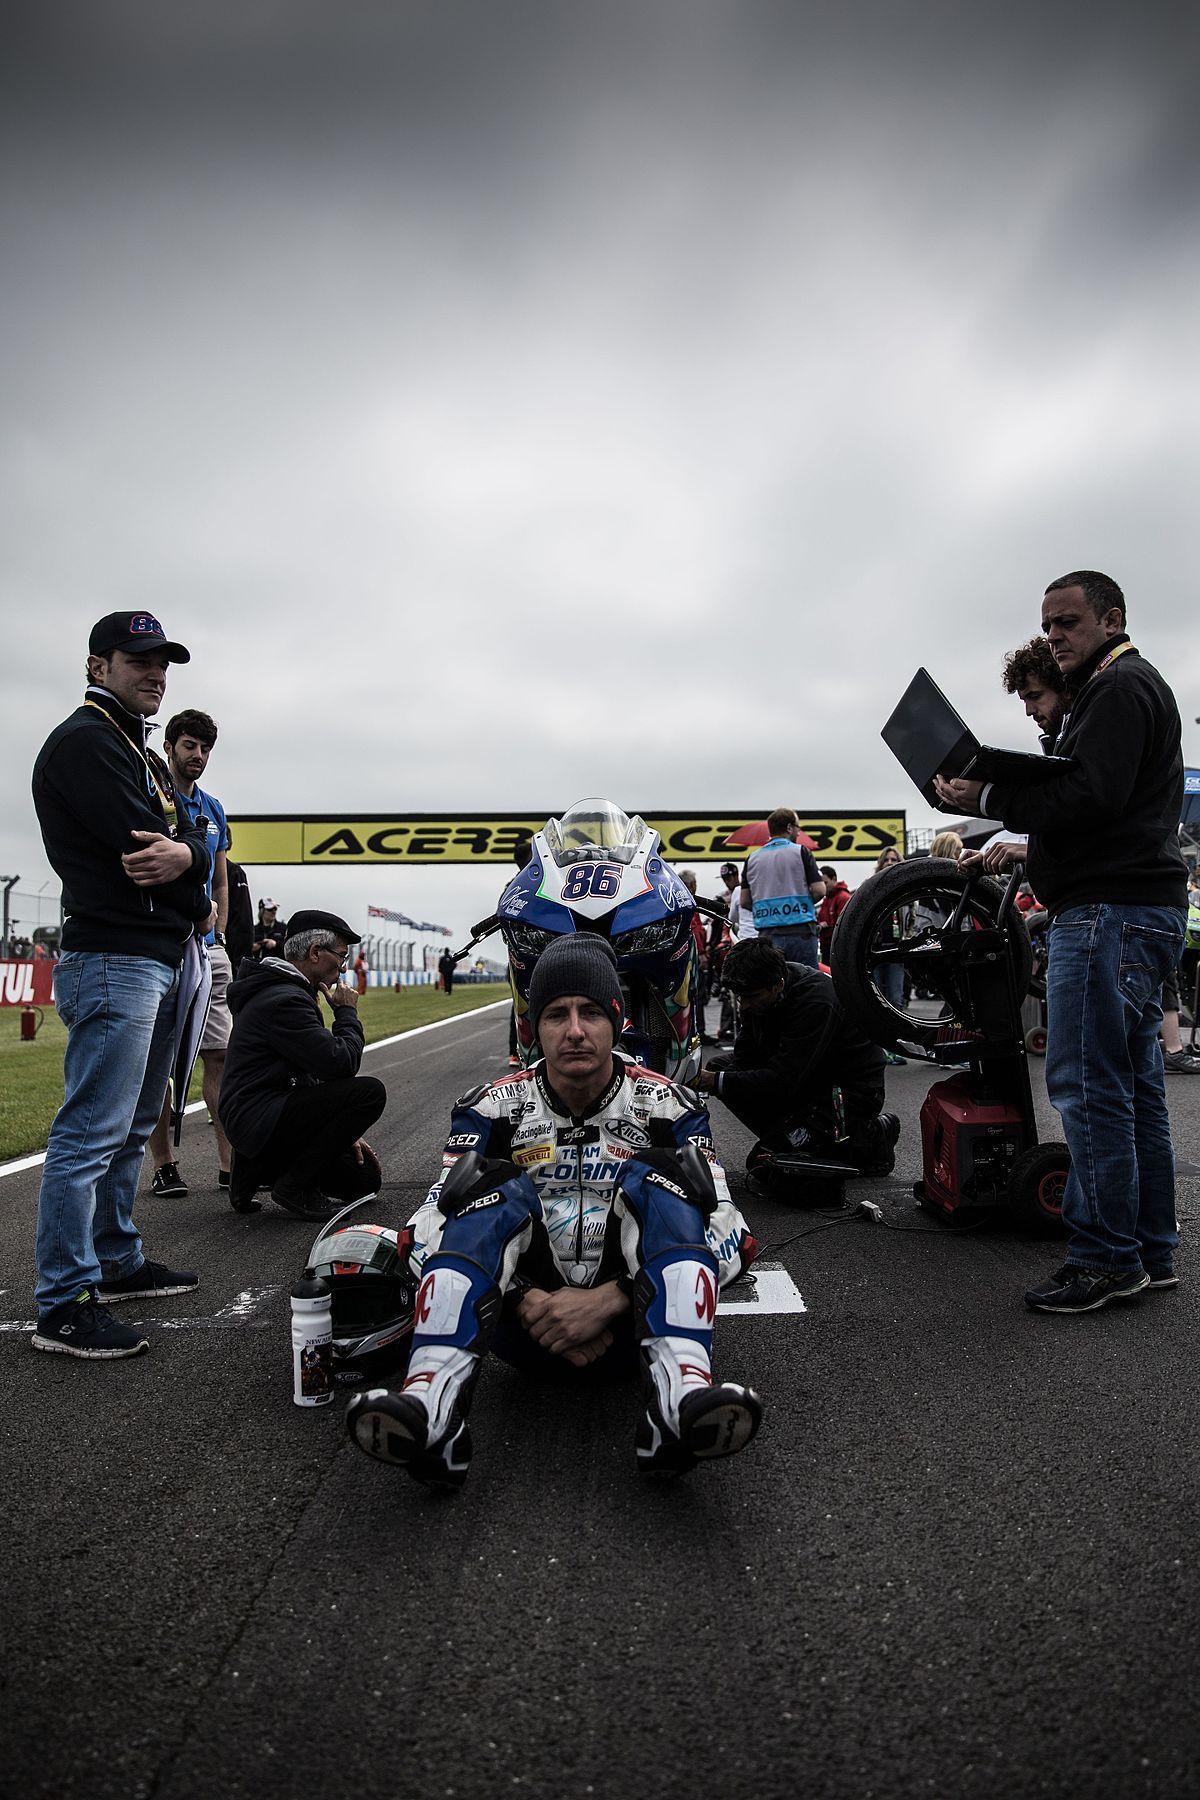 Image Result For Superbike Races